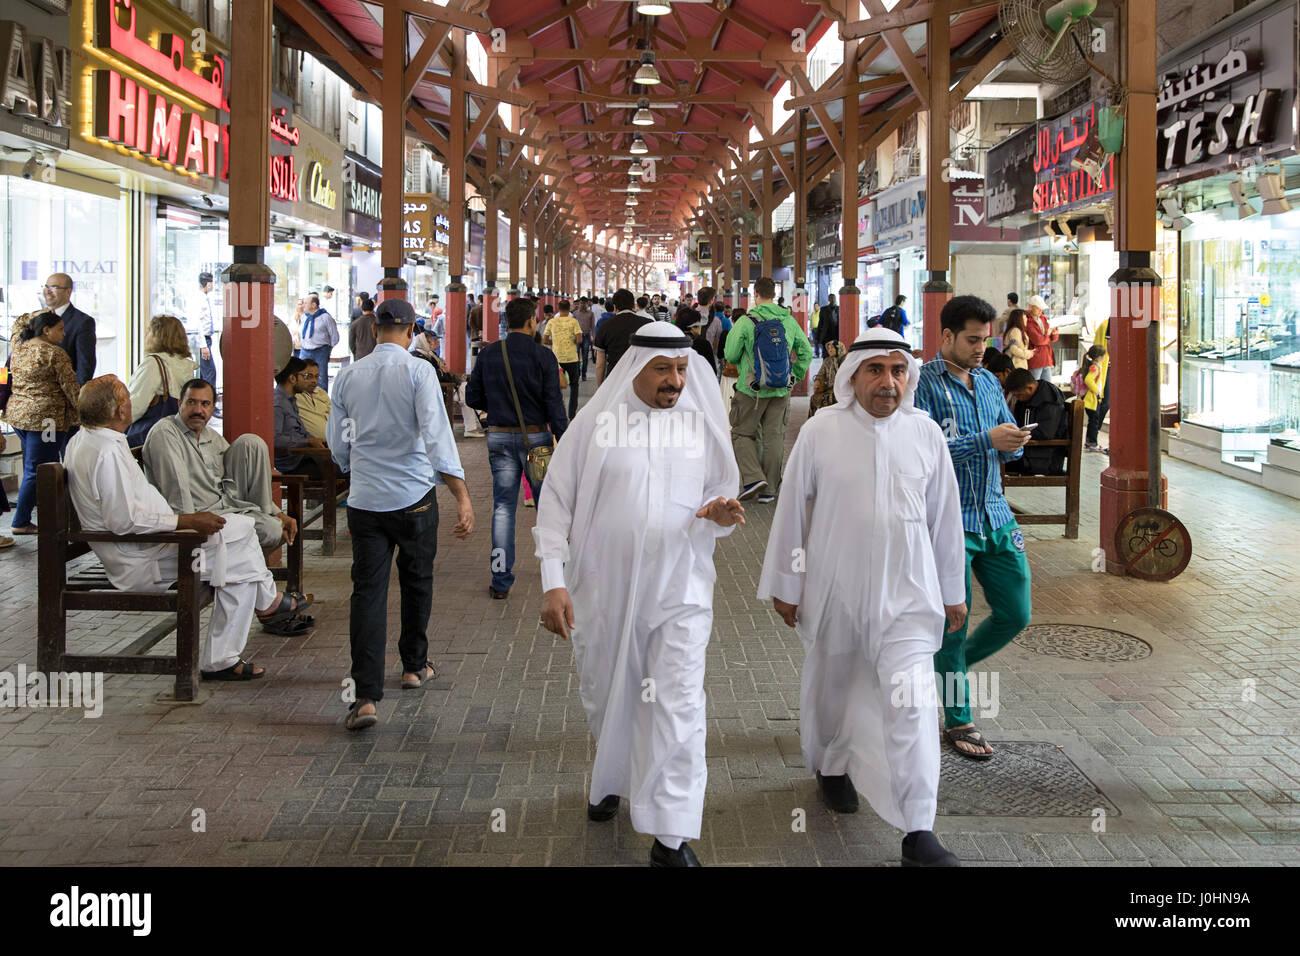 The Deira Gold Souk, Dubai - Stock Image